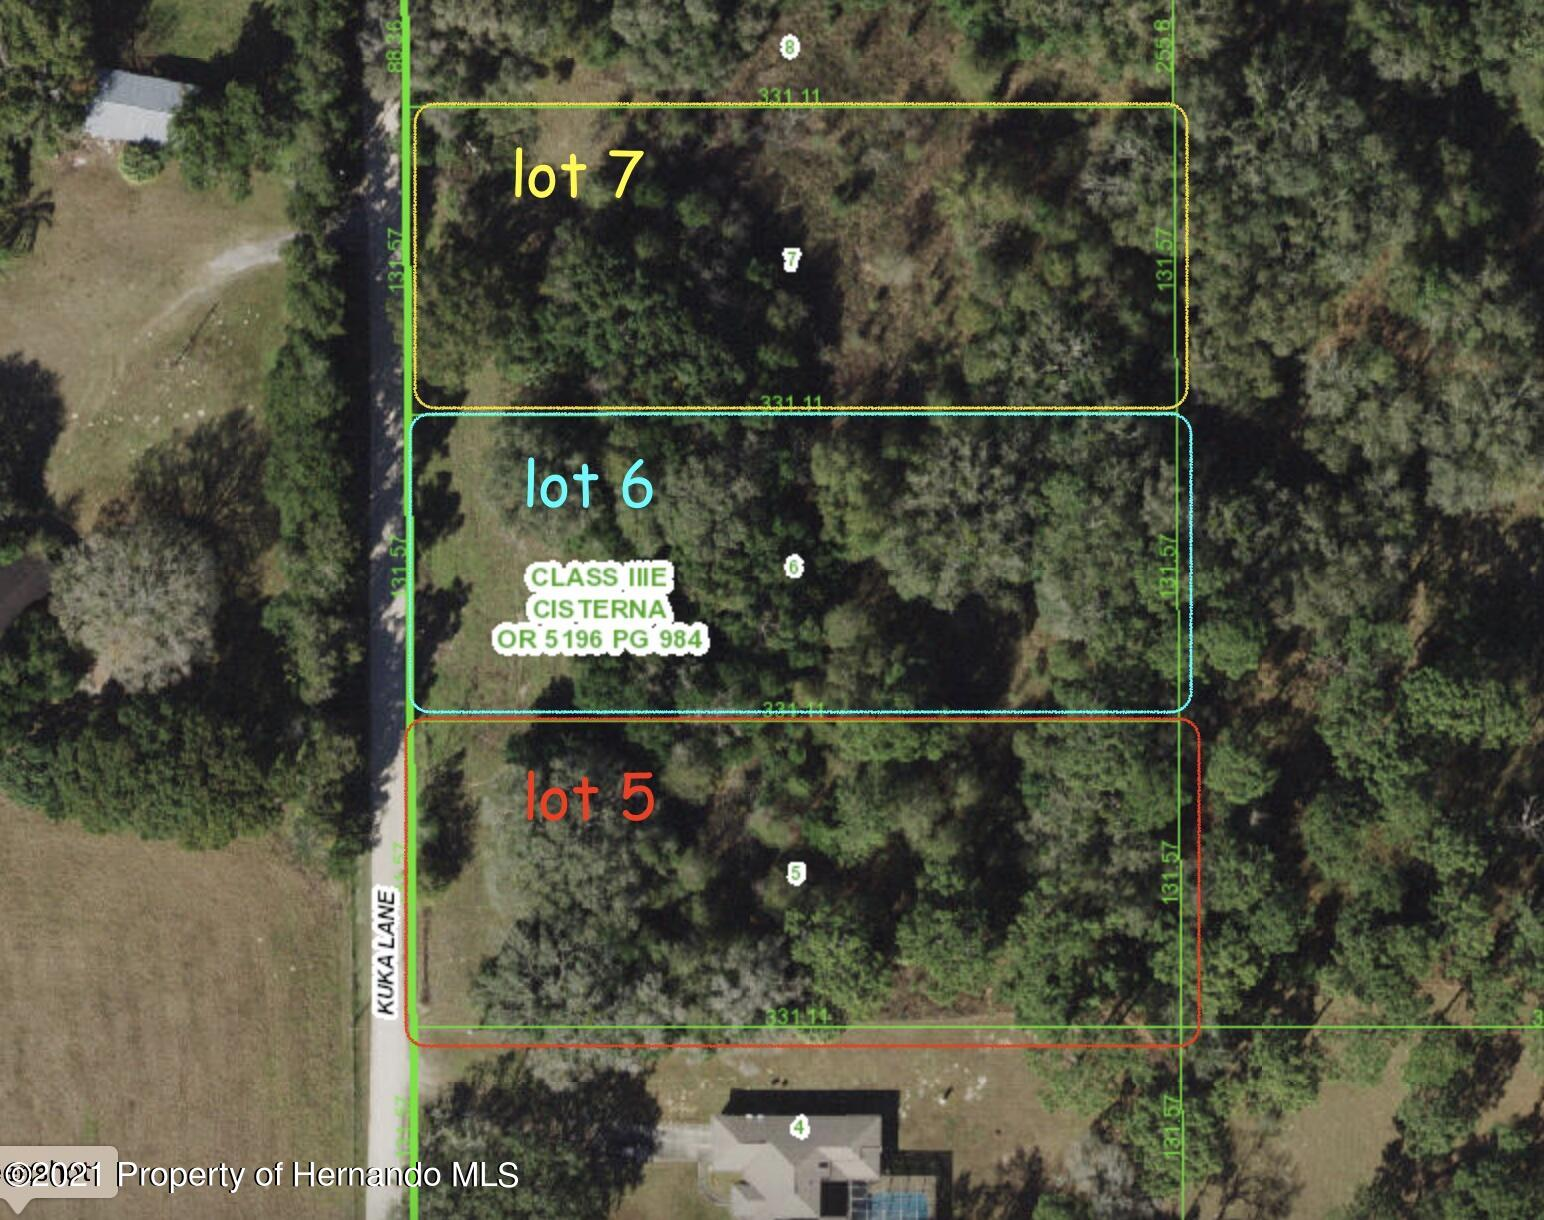 Listing Details for 0 Kuka (lot 5) Lane, Spring Hill Pasco, FL 34610